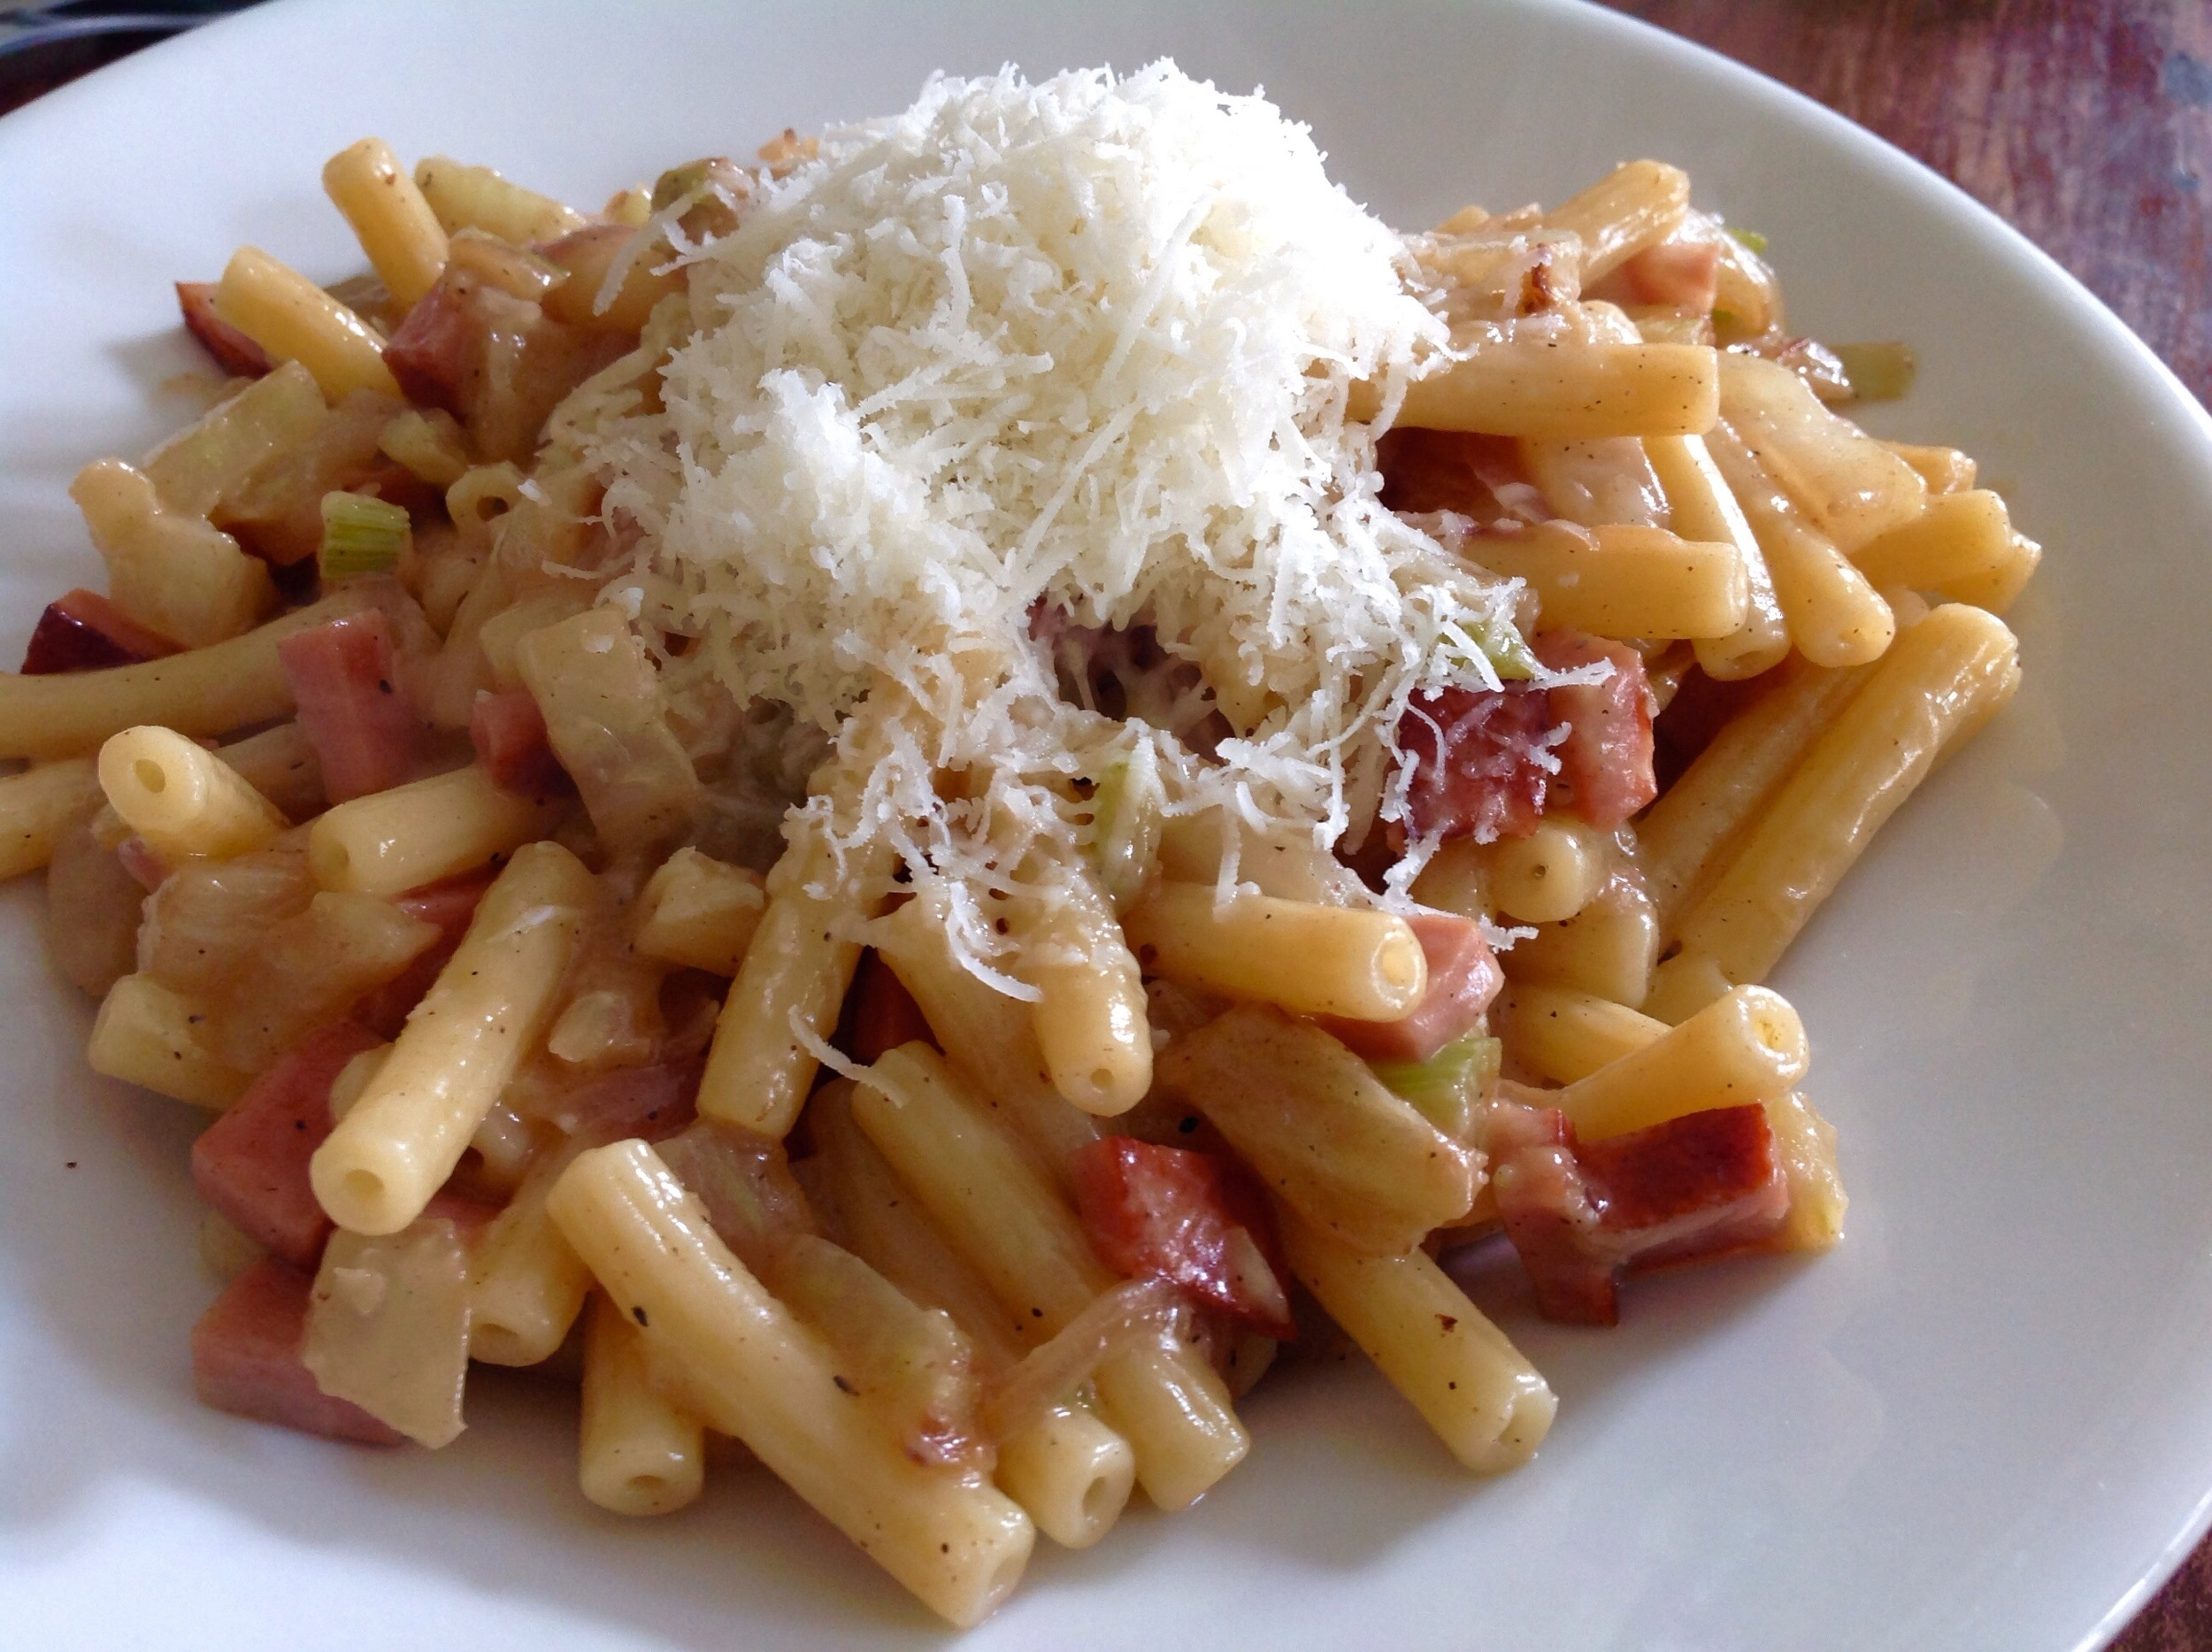 Homemade pasta in Parma